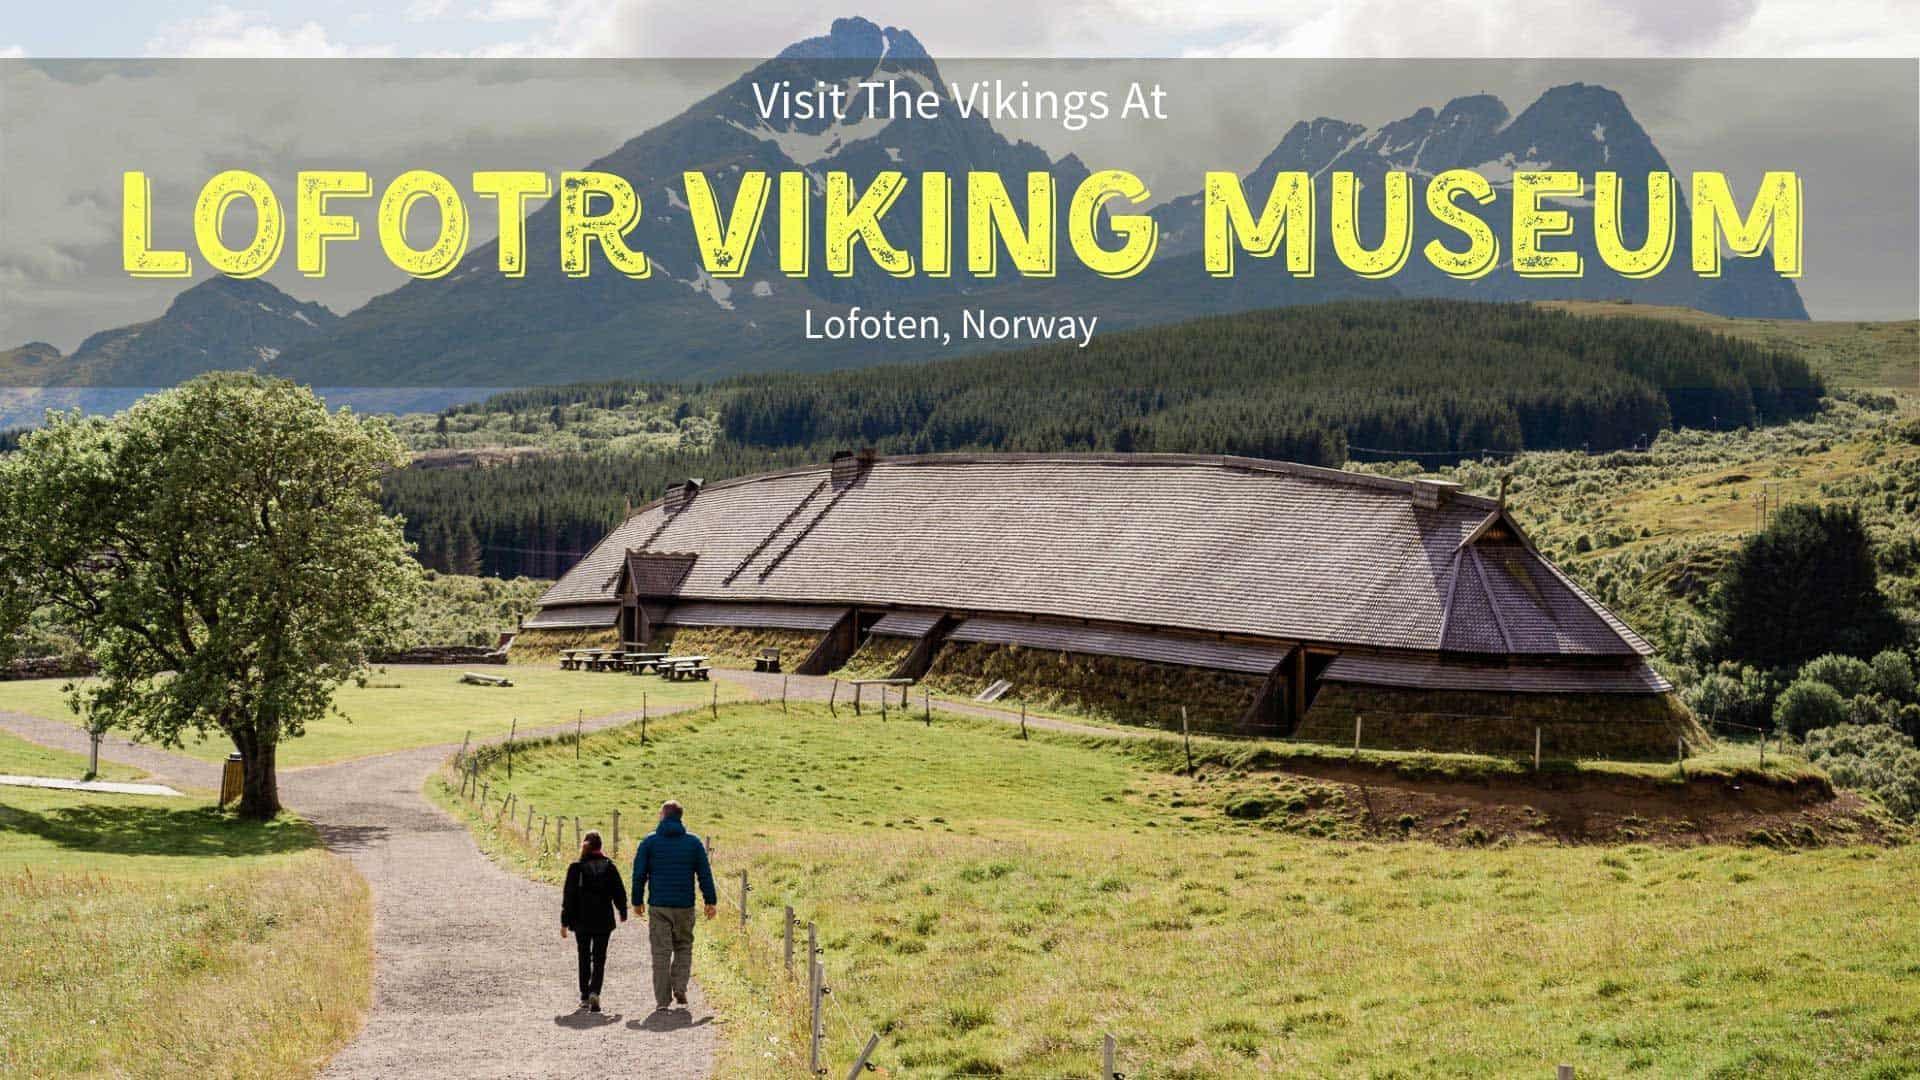 The Ultimate Guide to Lofotr Viking Museum, Lofoten, Norway